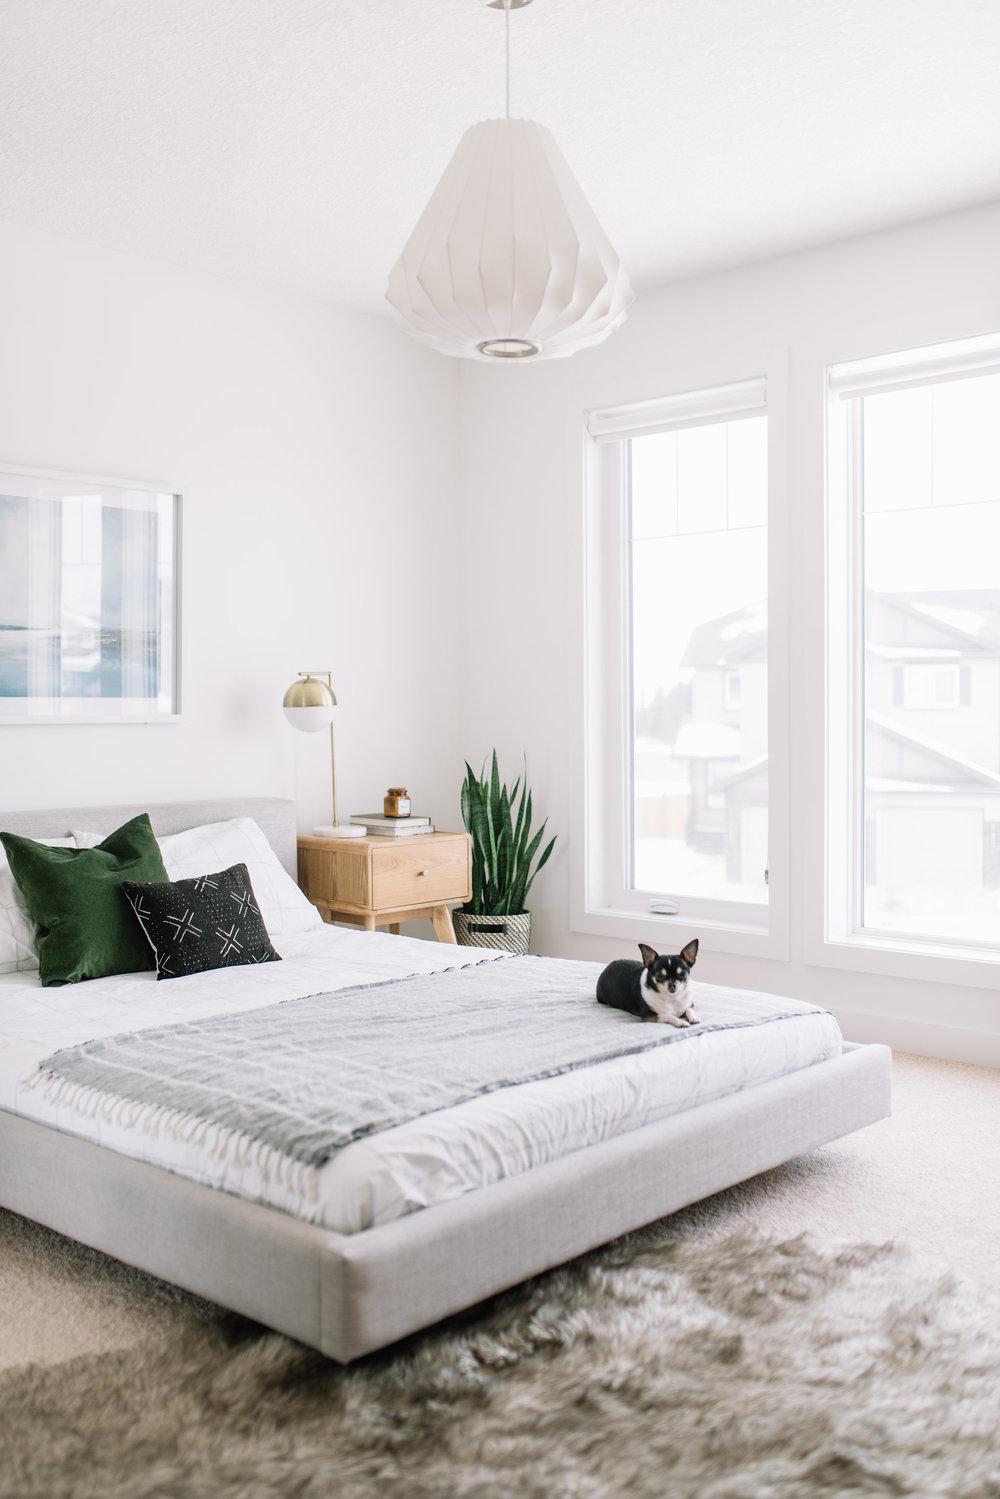 pet friendly interior design tips